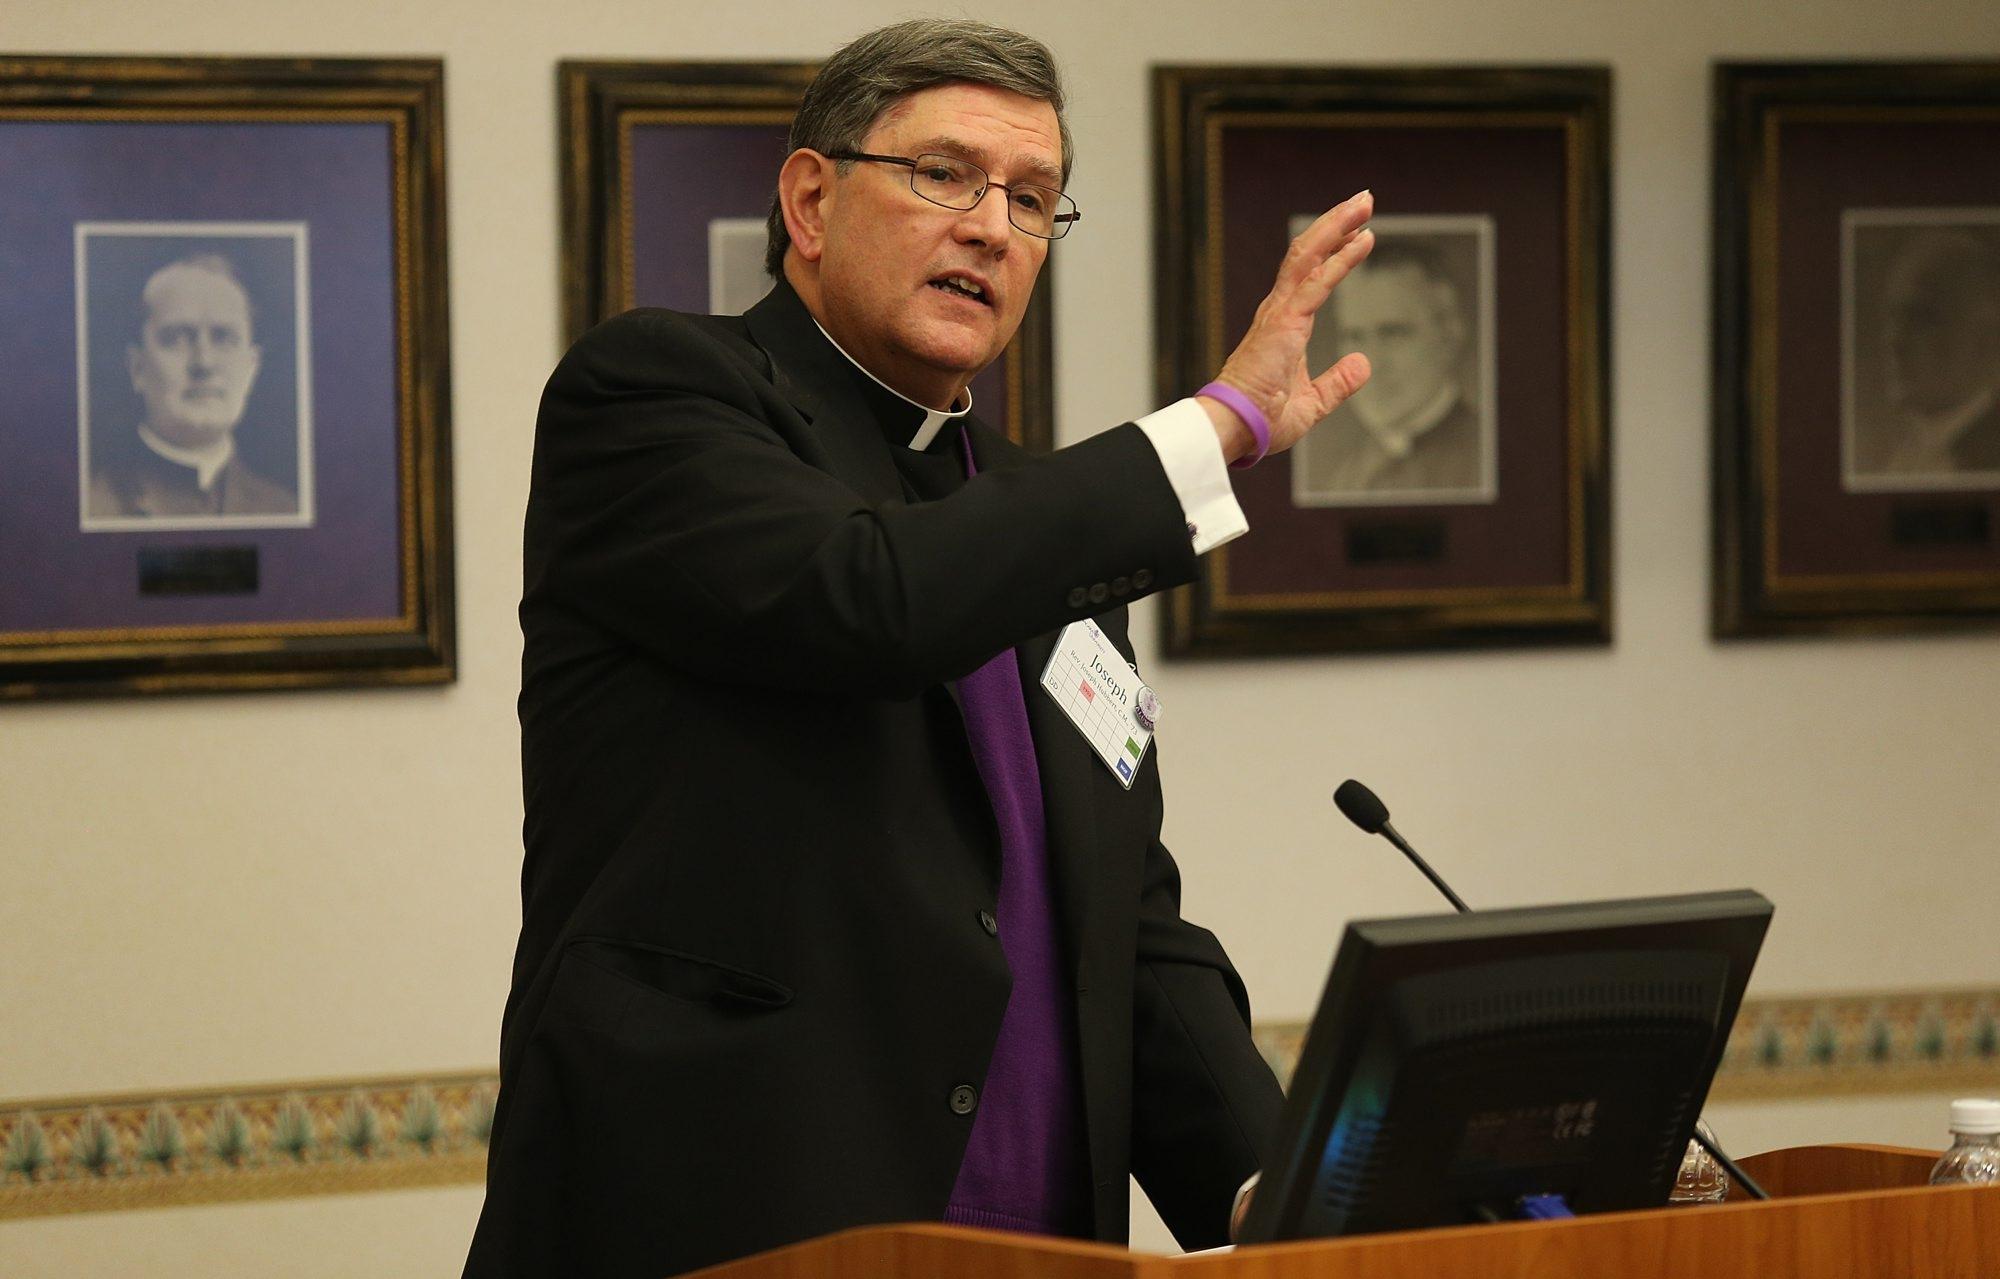 The Rev. Joseph G. Hubbert